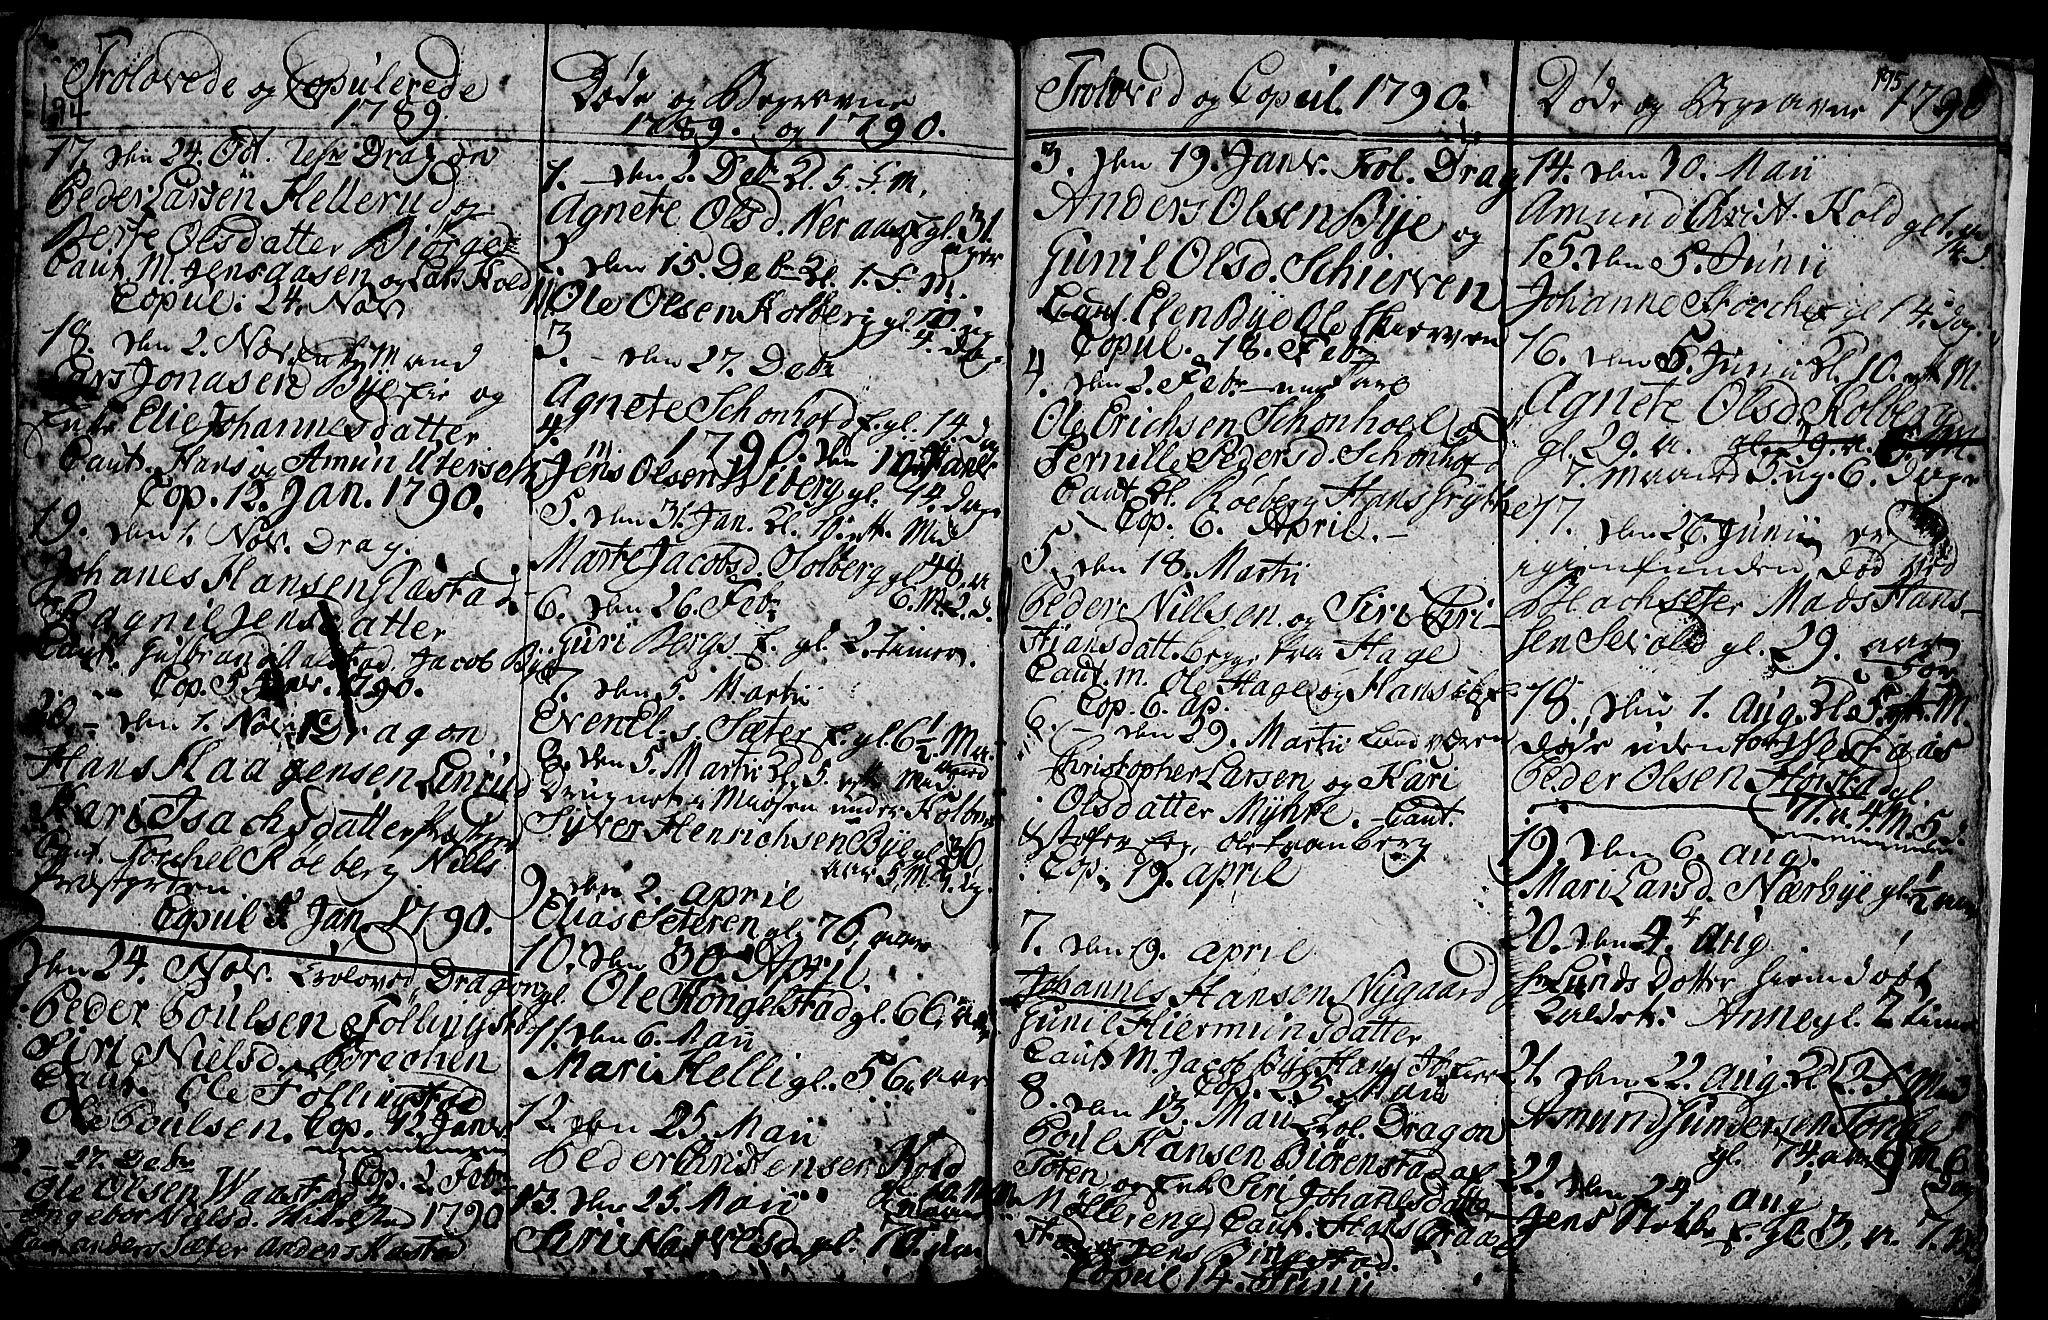 SAH, Vardal prestekontor, H/Ha/Hab/L0001: Klokkerbok nr. 1, 1771-1790, s. 194-195